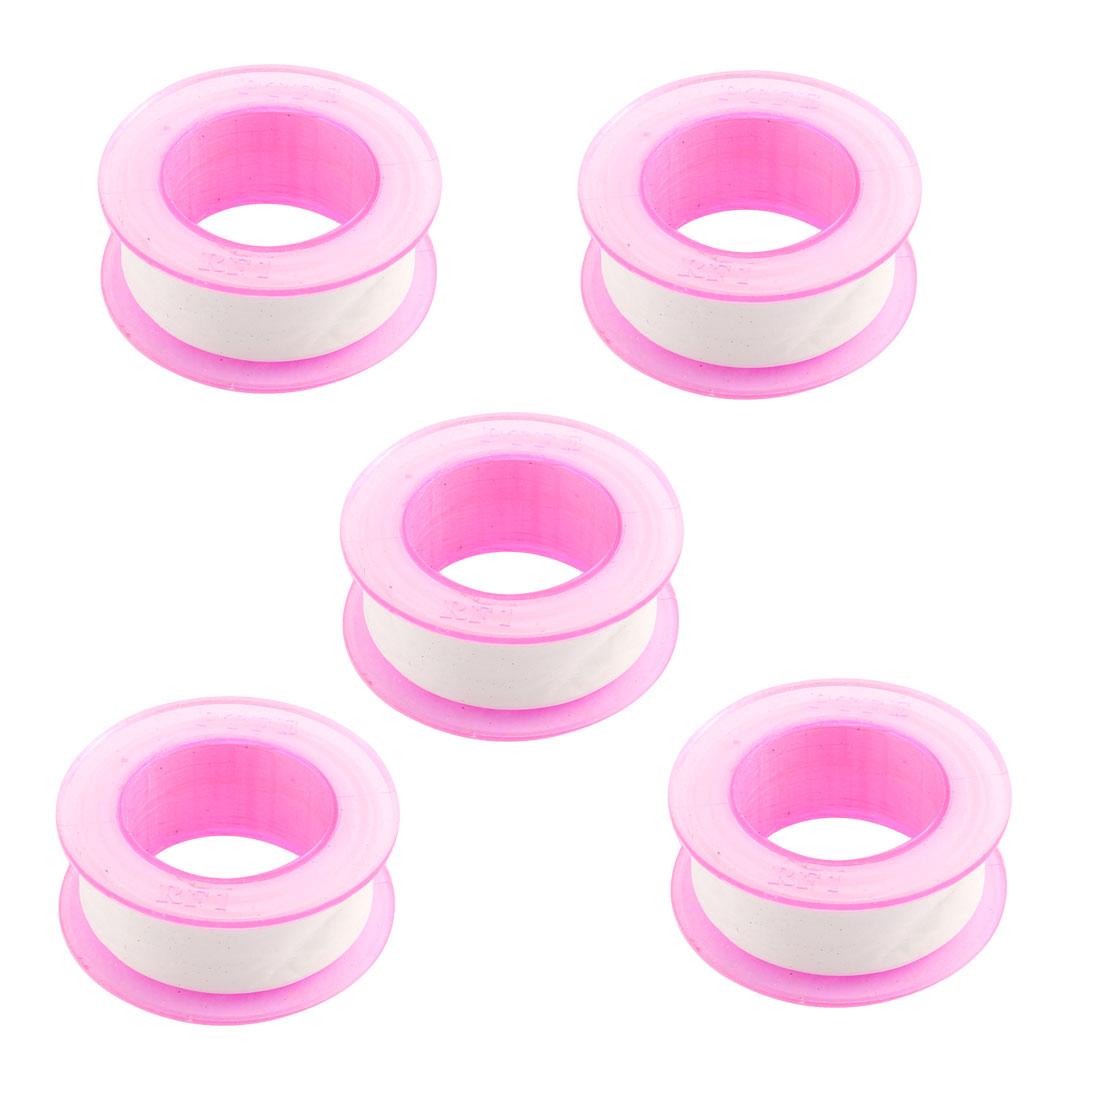 5pcs 16mm Width White PTFE Seal Tape Water Pipe Air Hose Plumbing Plumber Thread Sealant